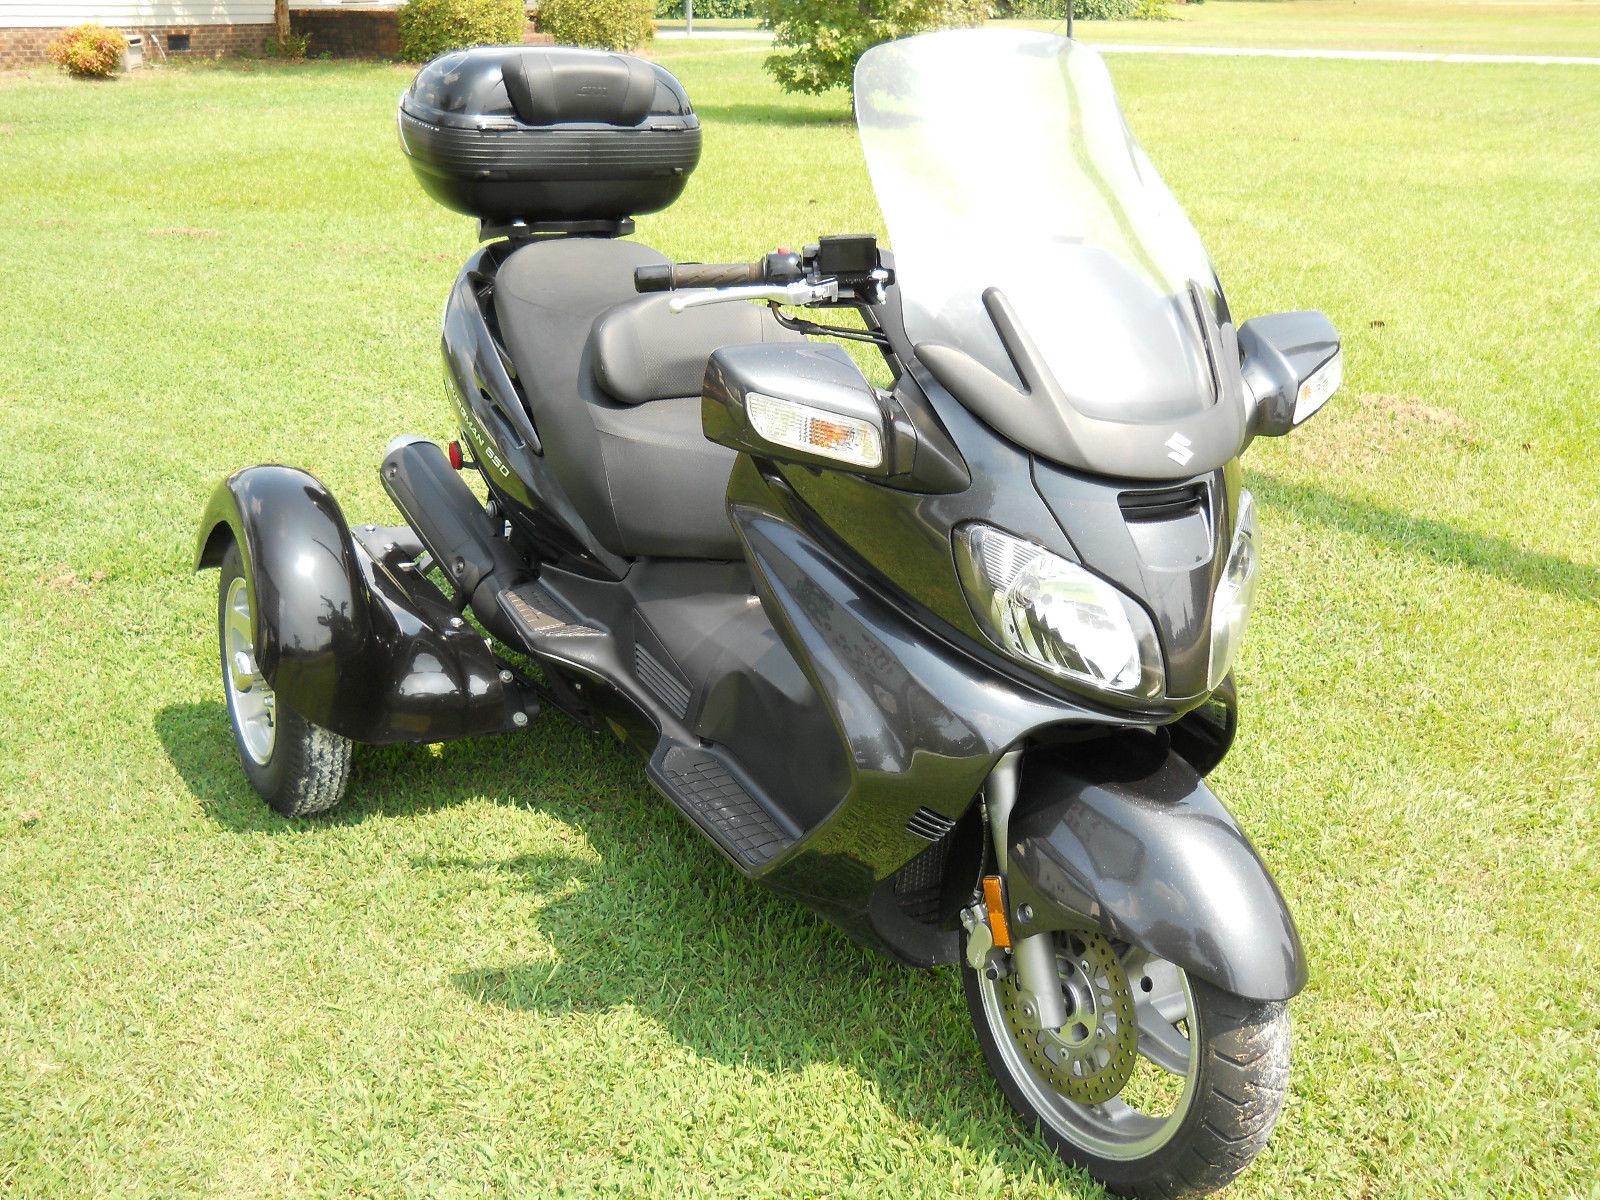 2007 suzuki burgman 650 scooter with tow pac trike kit. Black Bedroom Furniture Sets. Home Design Ideas